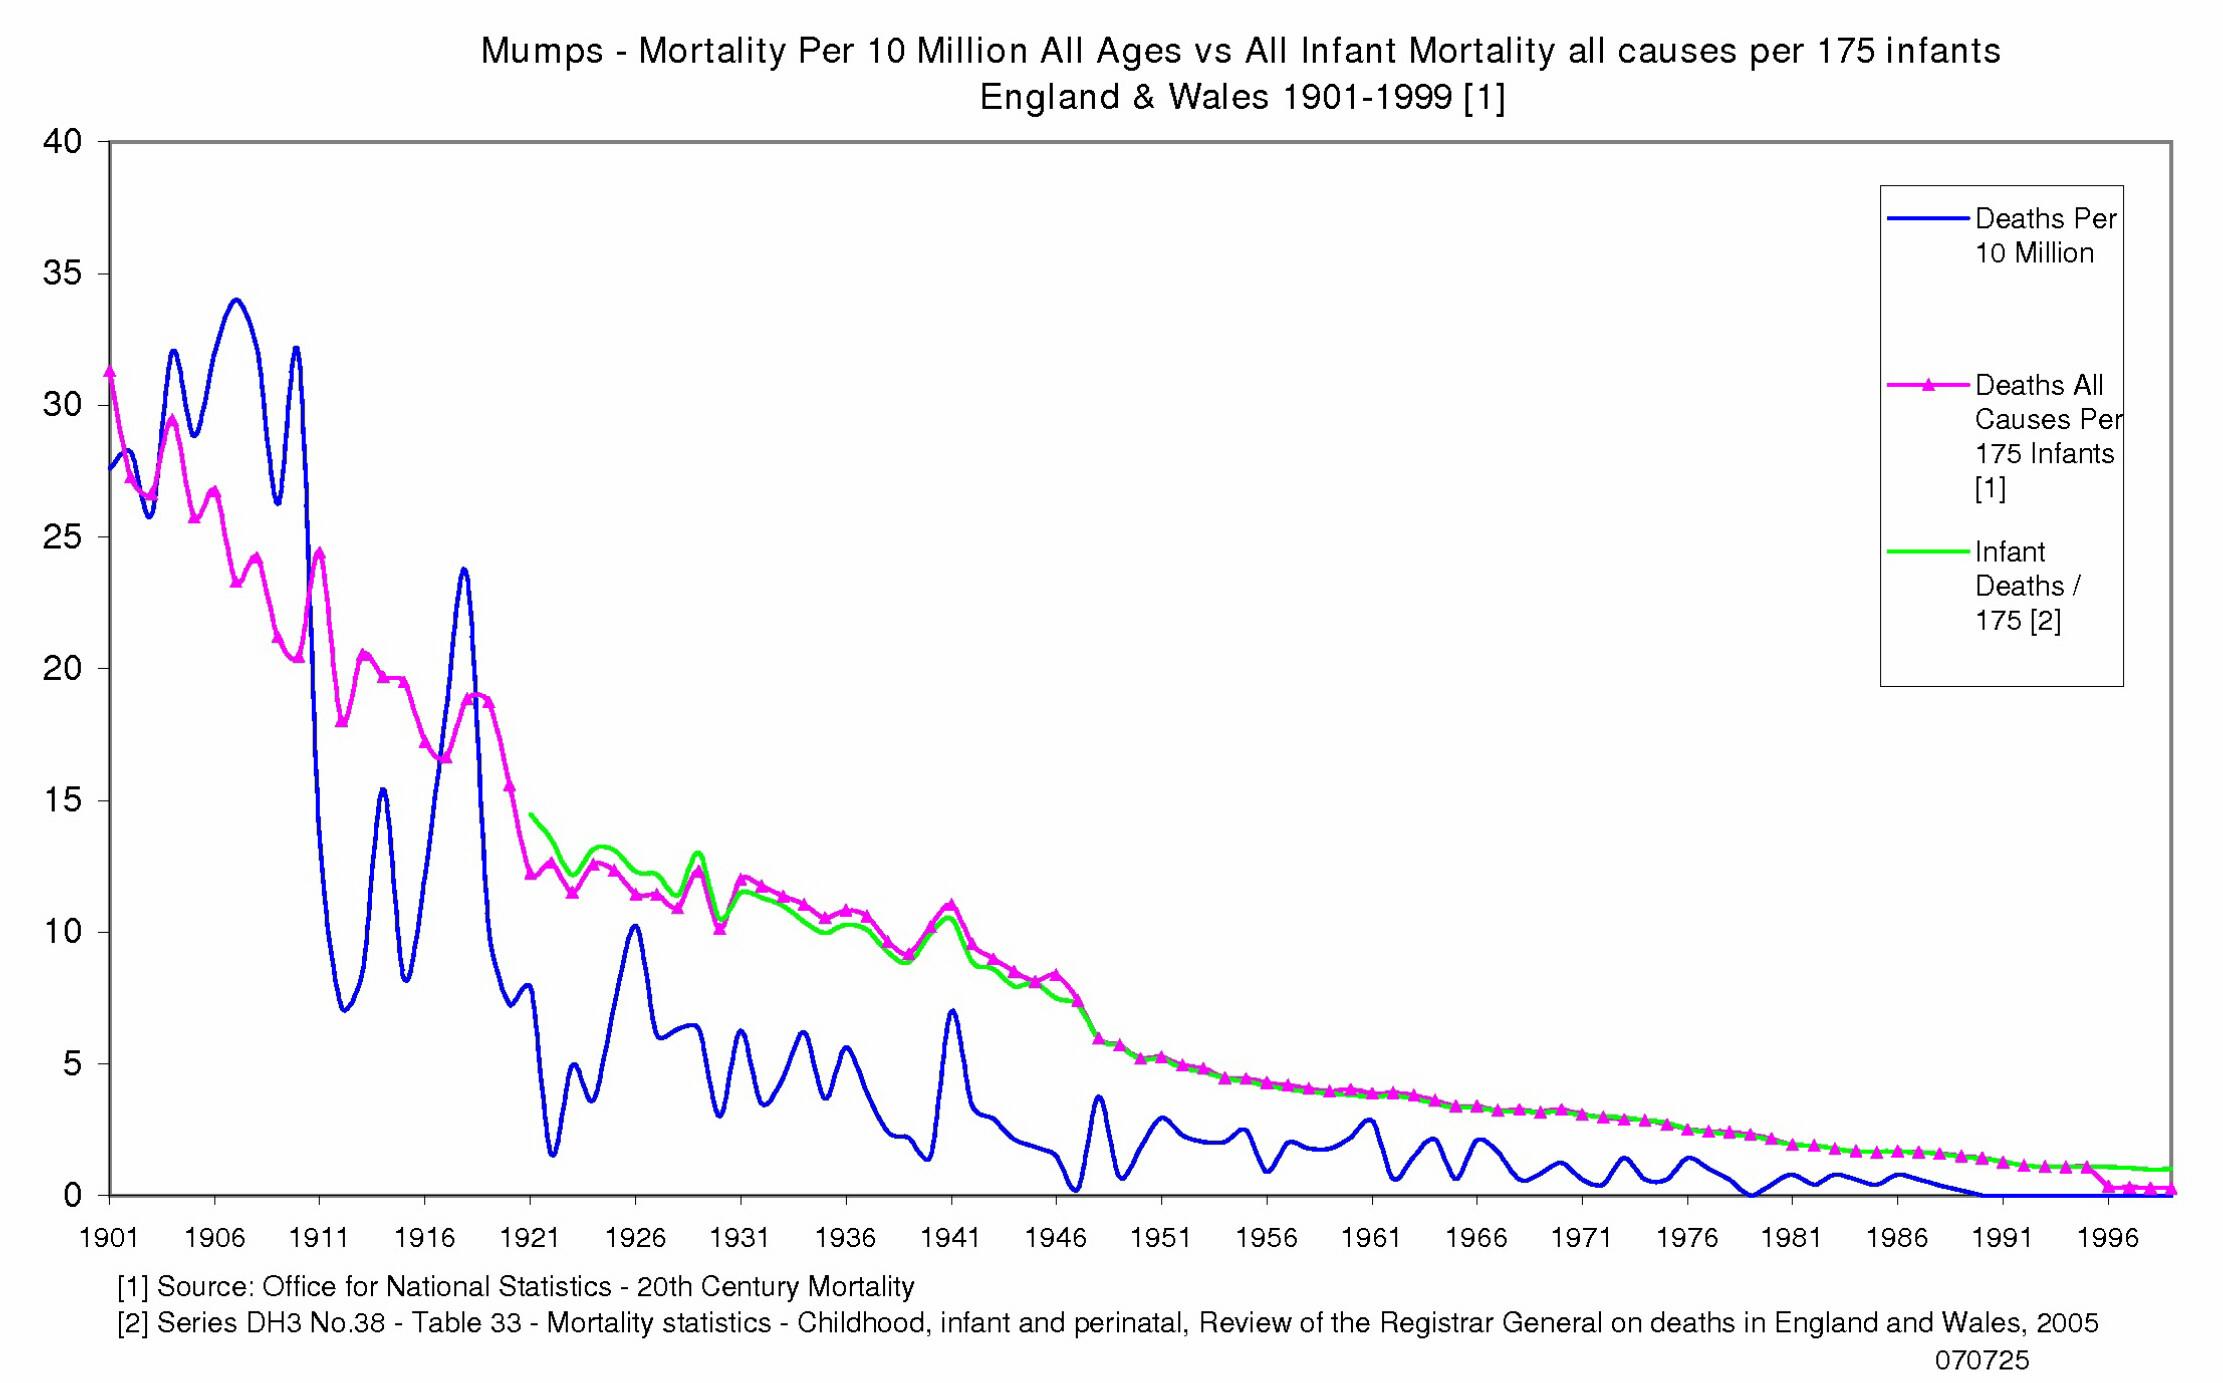 Mumps Mortality England & Wales 1901 to 1999